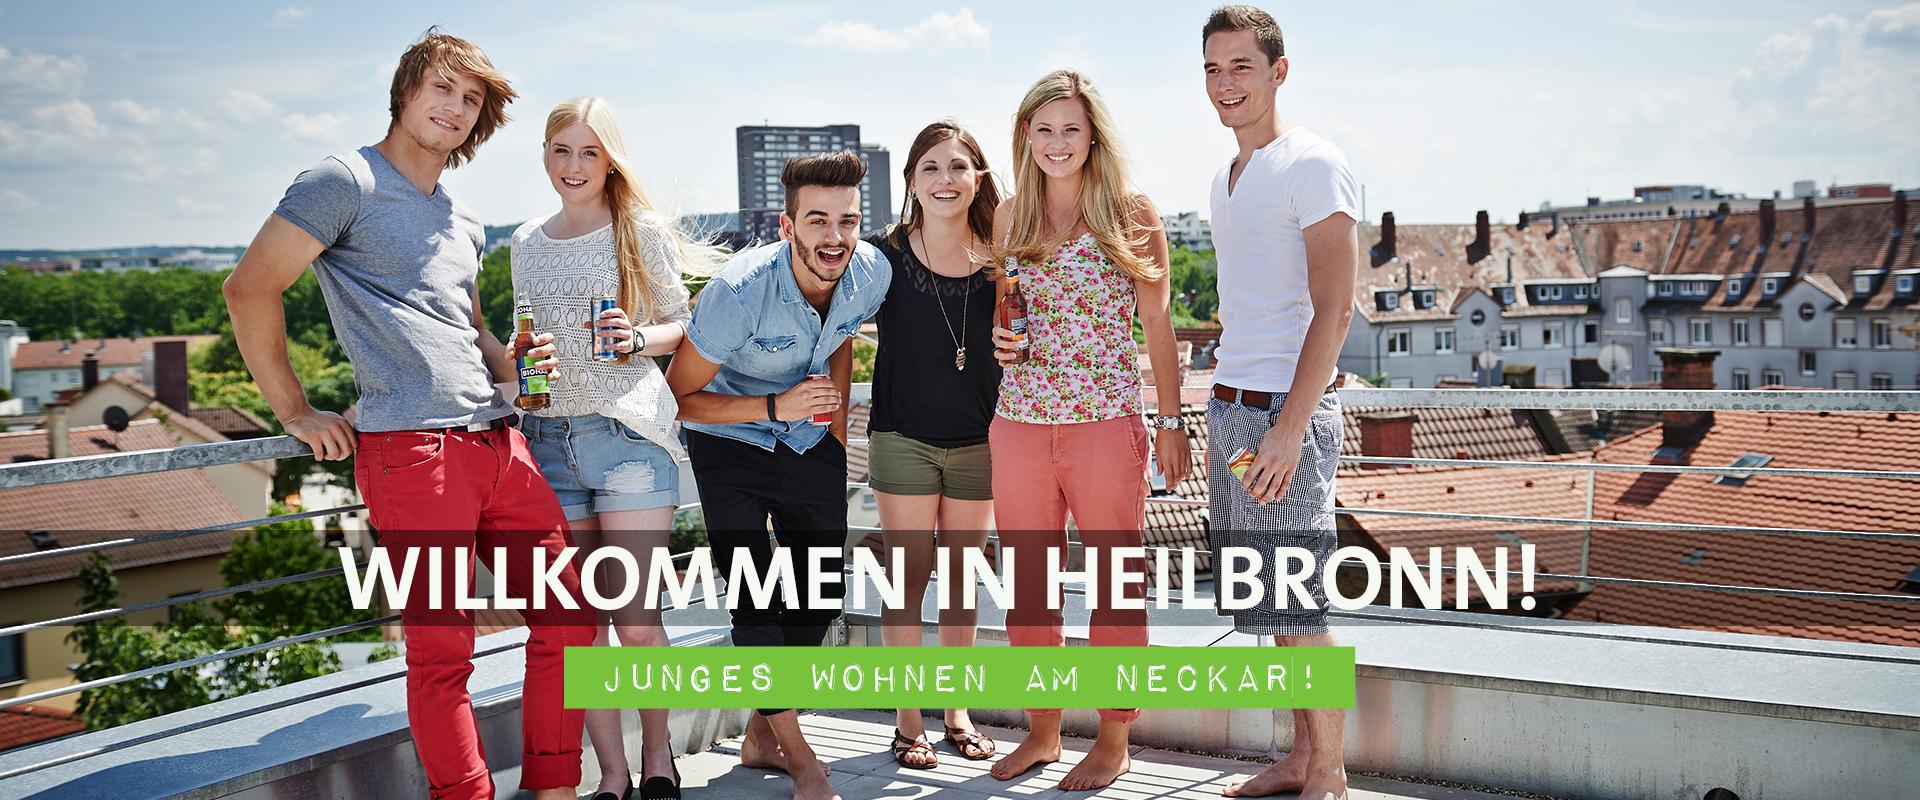 Junges Wohnen in Heilbronn am Neckar